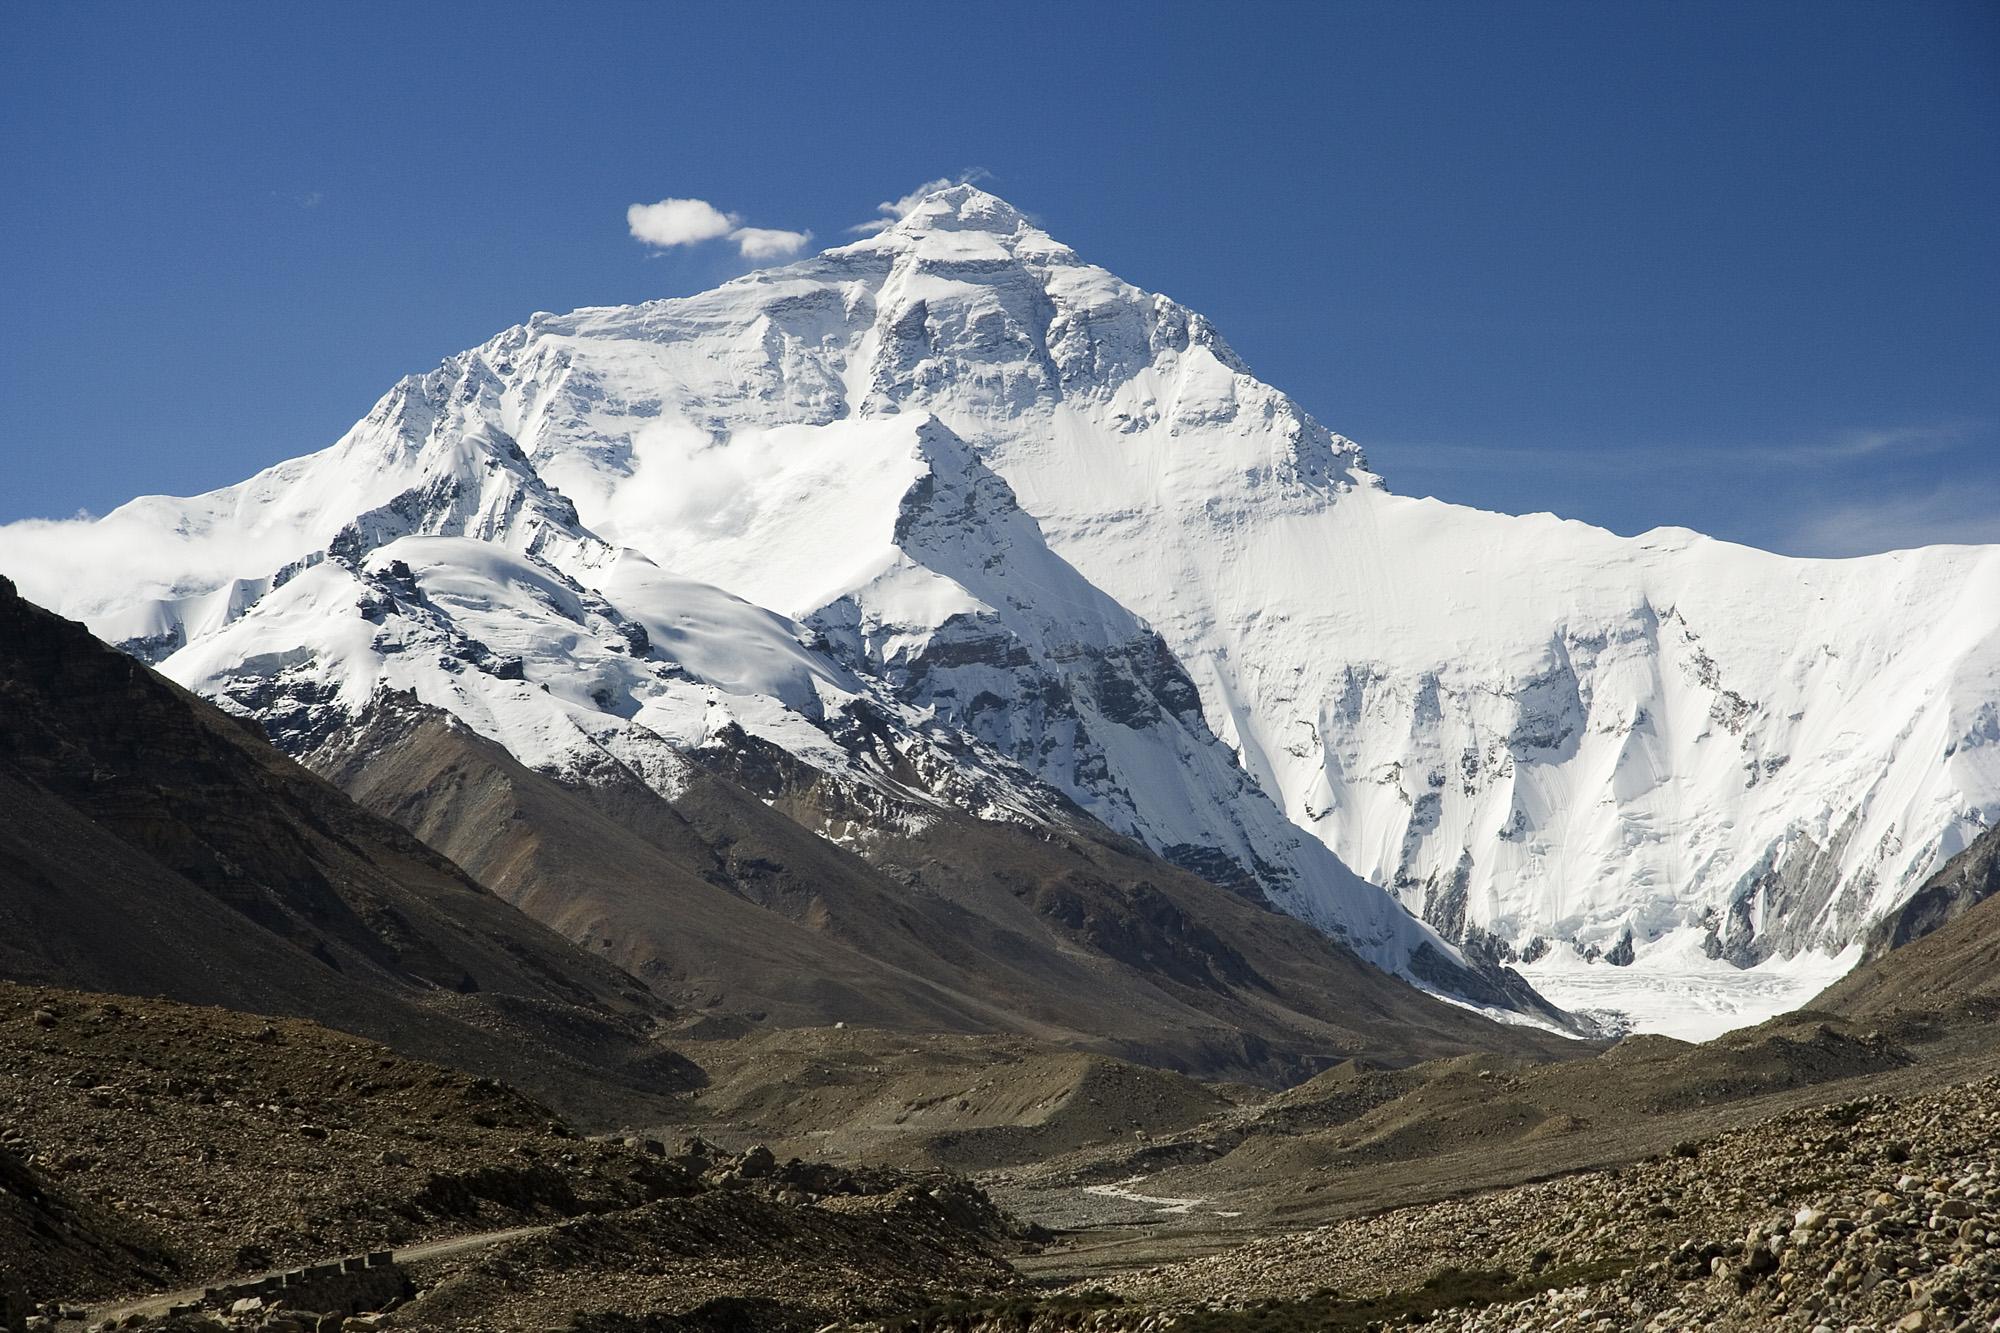 https://i2.wp.com/upload.wikimedia.org/wikipedia/commons/e/e7/Everest_North_Face_toward_Base_Camp_Tibet_Luca_Galuzzi_2006.jpg